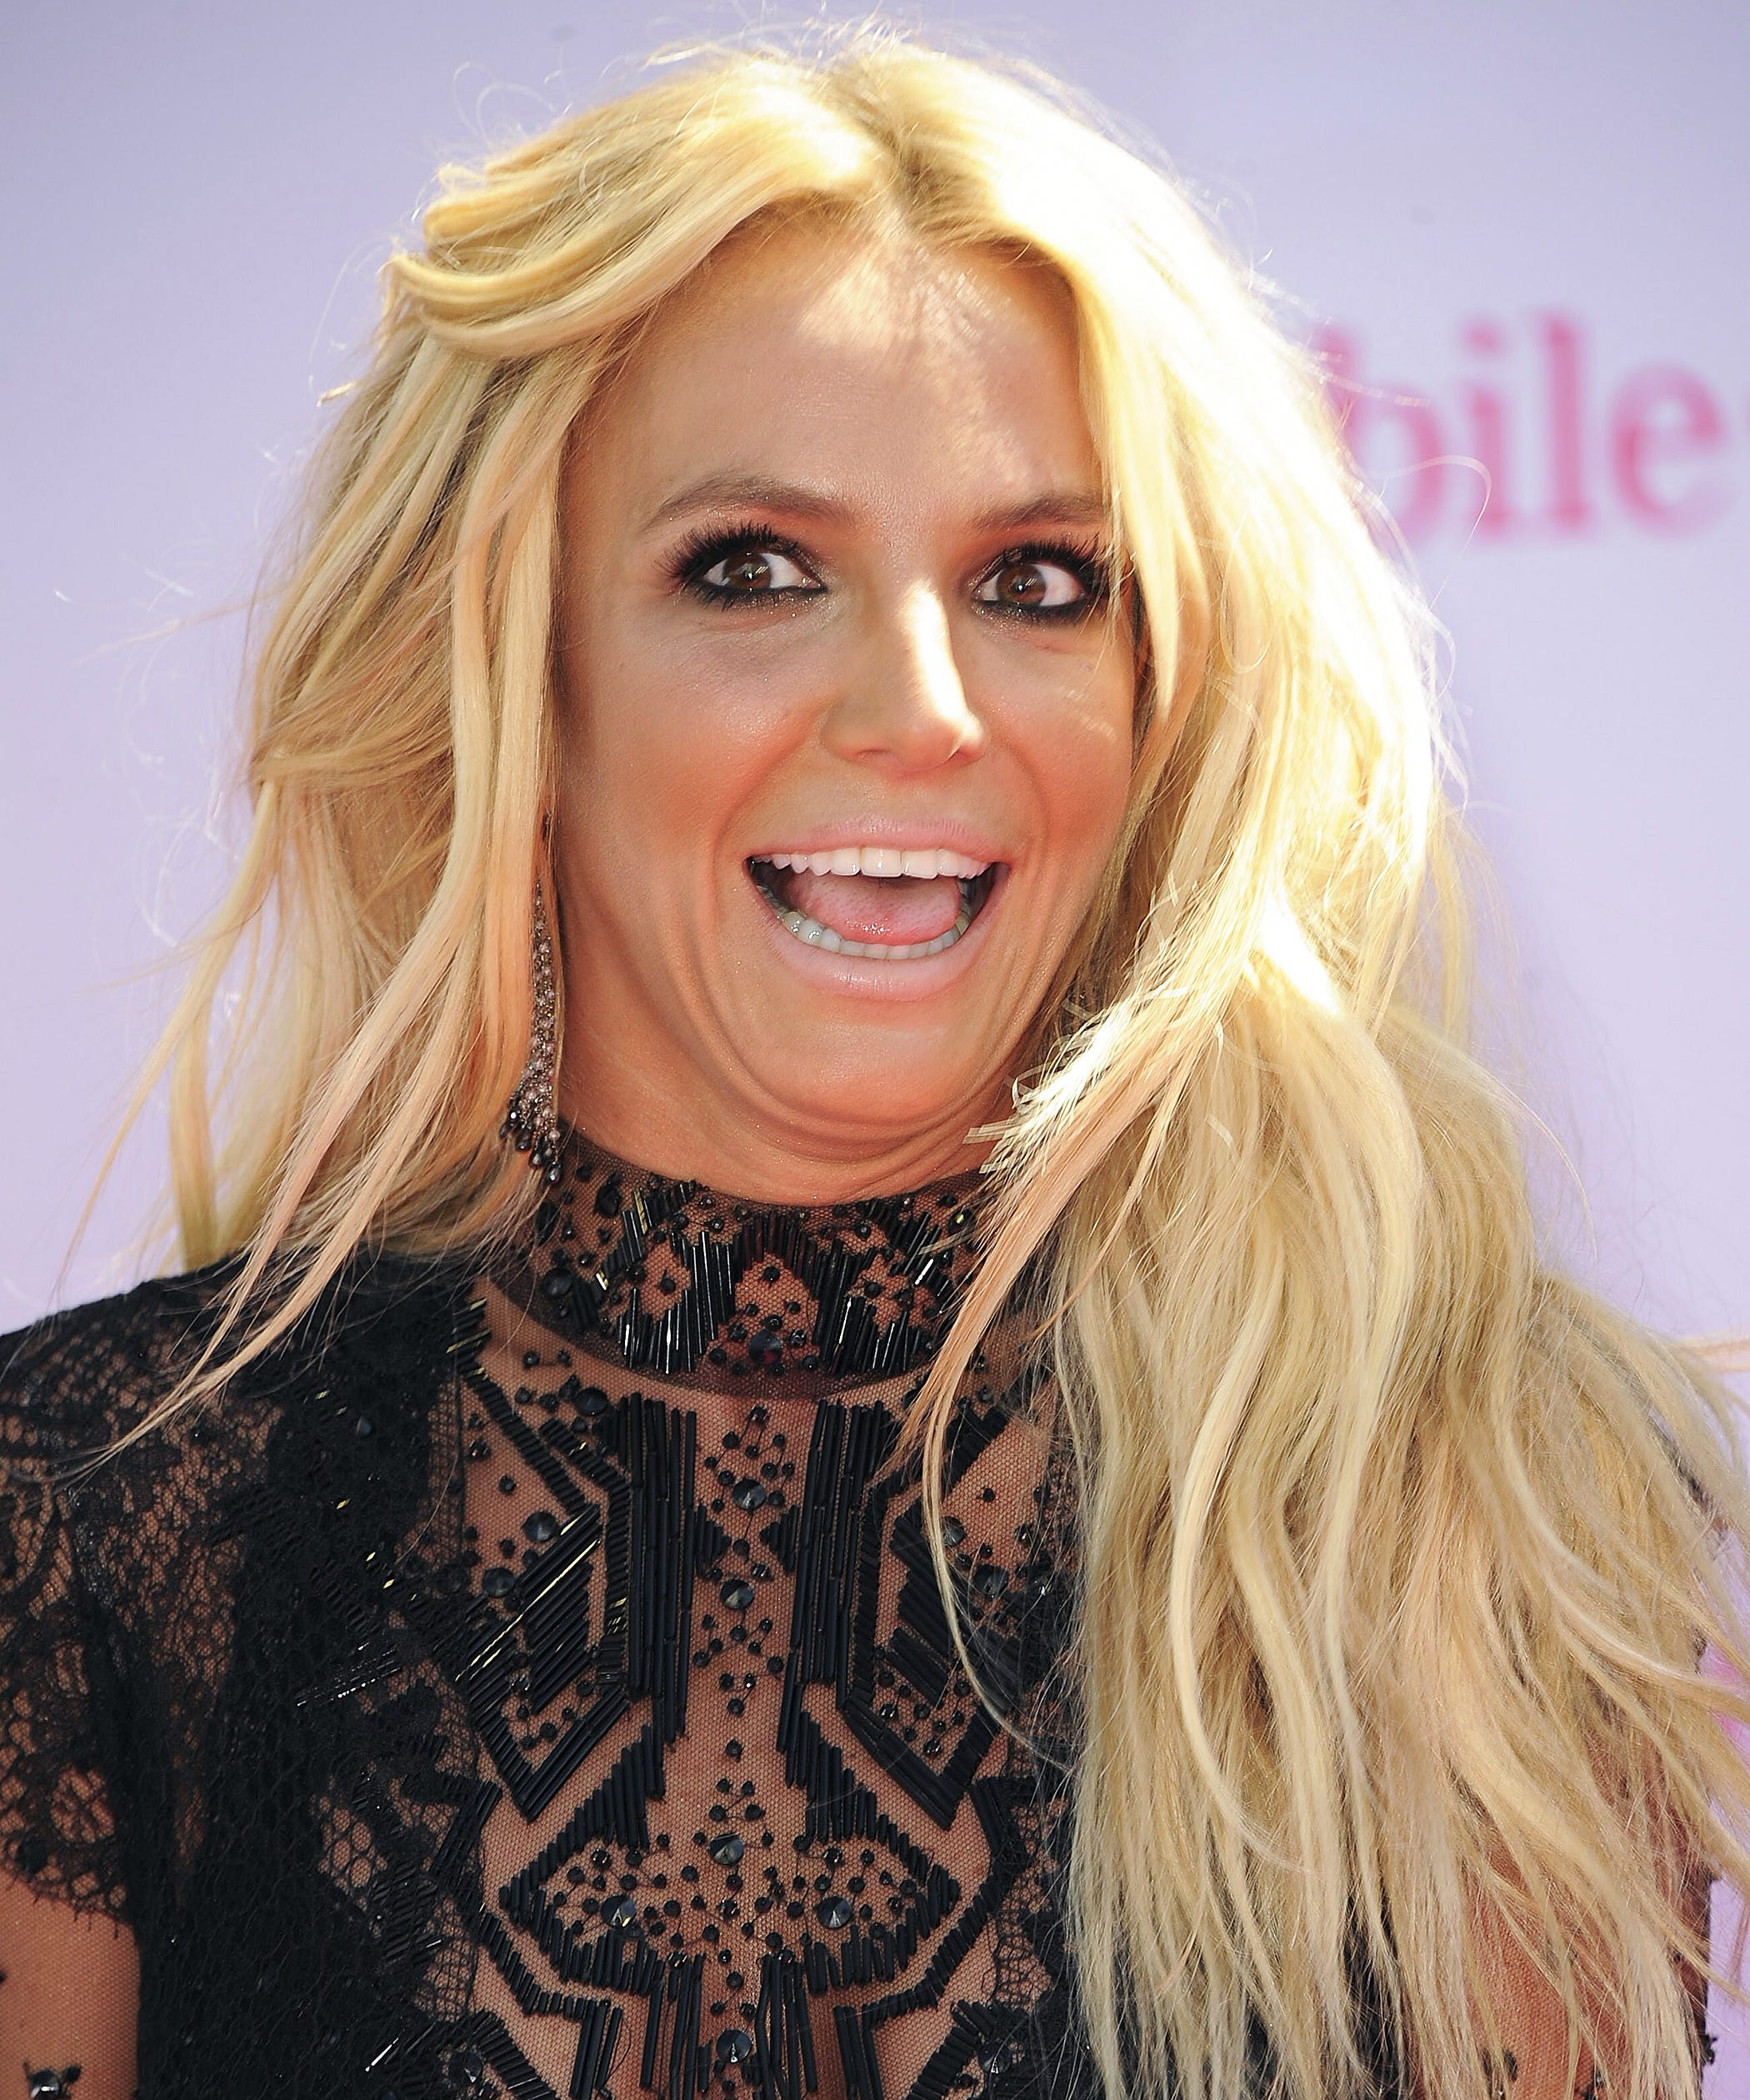 Britney Spears Funny Faces Photos Britney Spears Photos